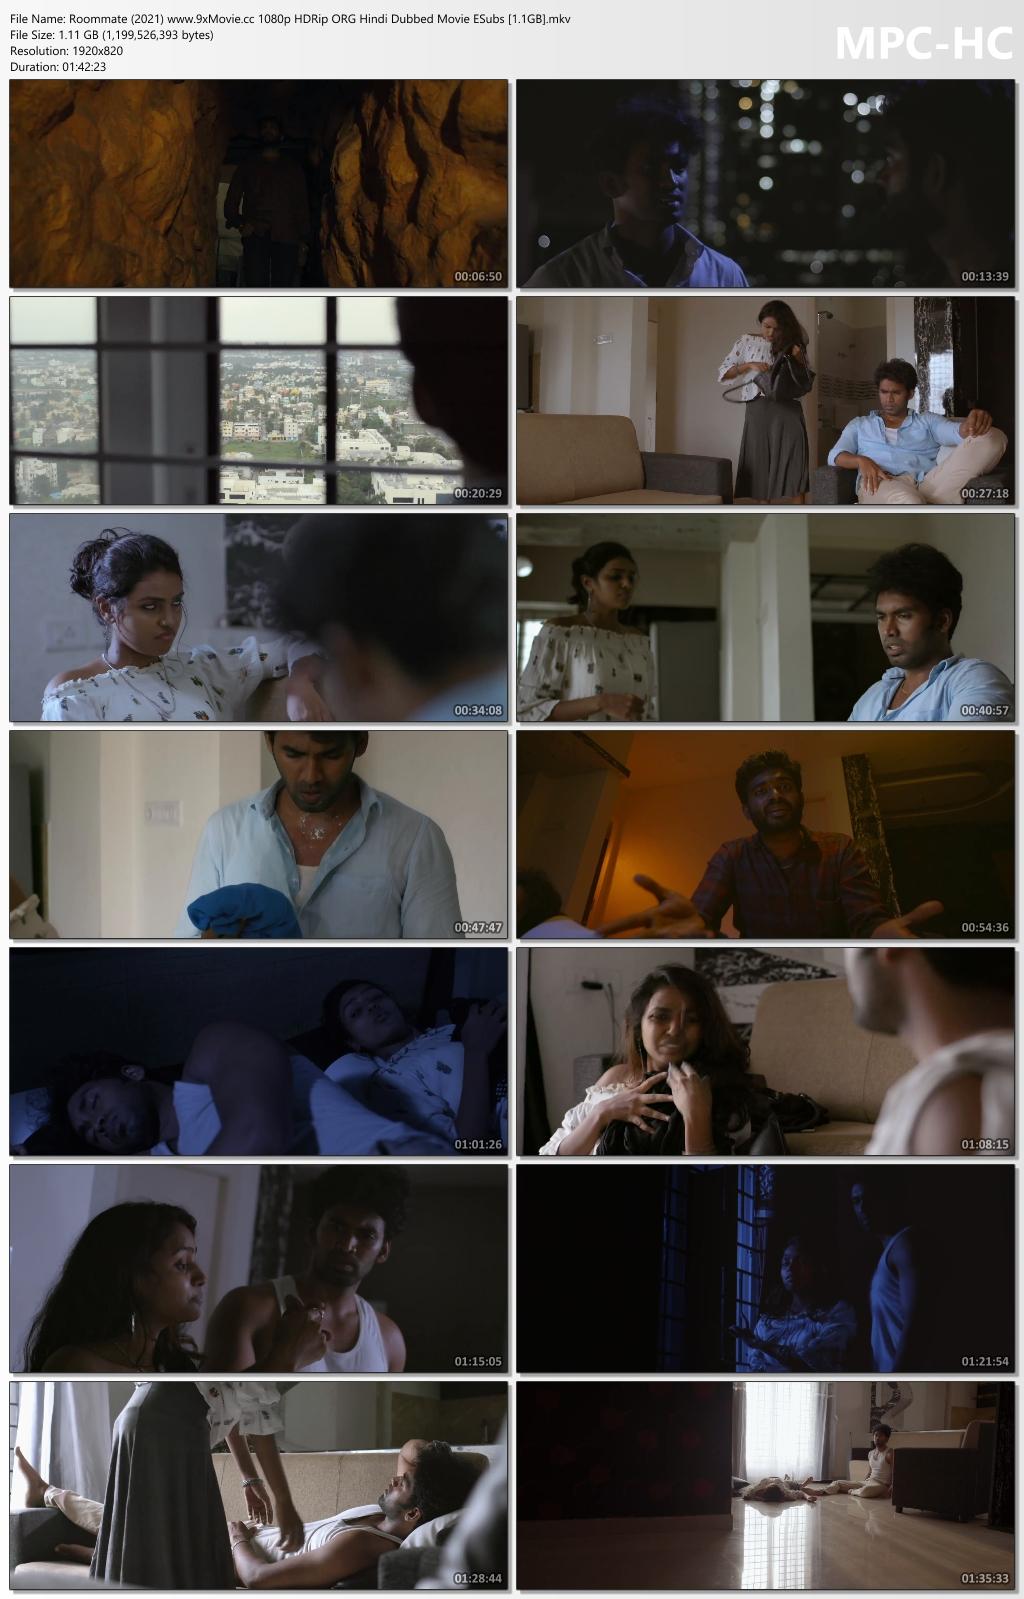 Roommate-2021-www-9x-Movie-cc-1080p-HDRip-ORG-Hindi-Dubbed-Movie-ESubs-1-1-GB-mkv